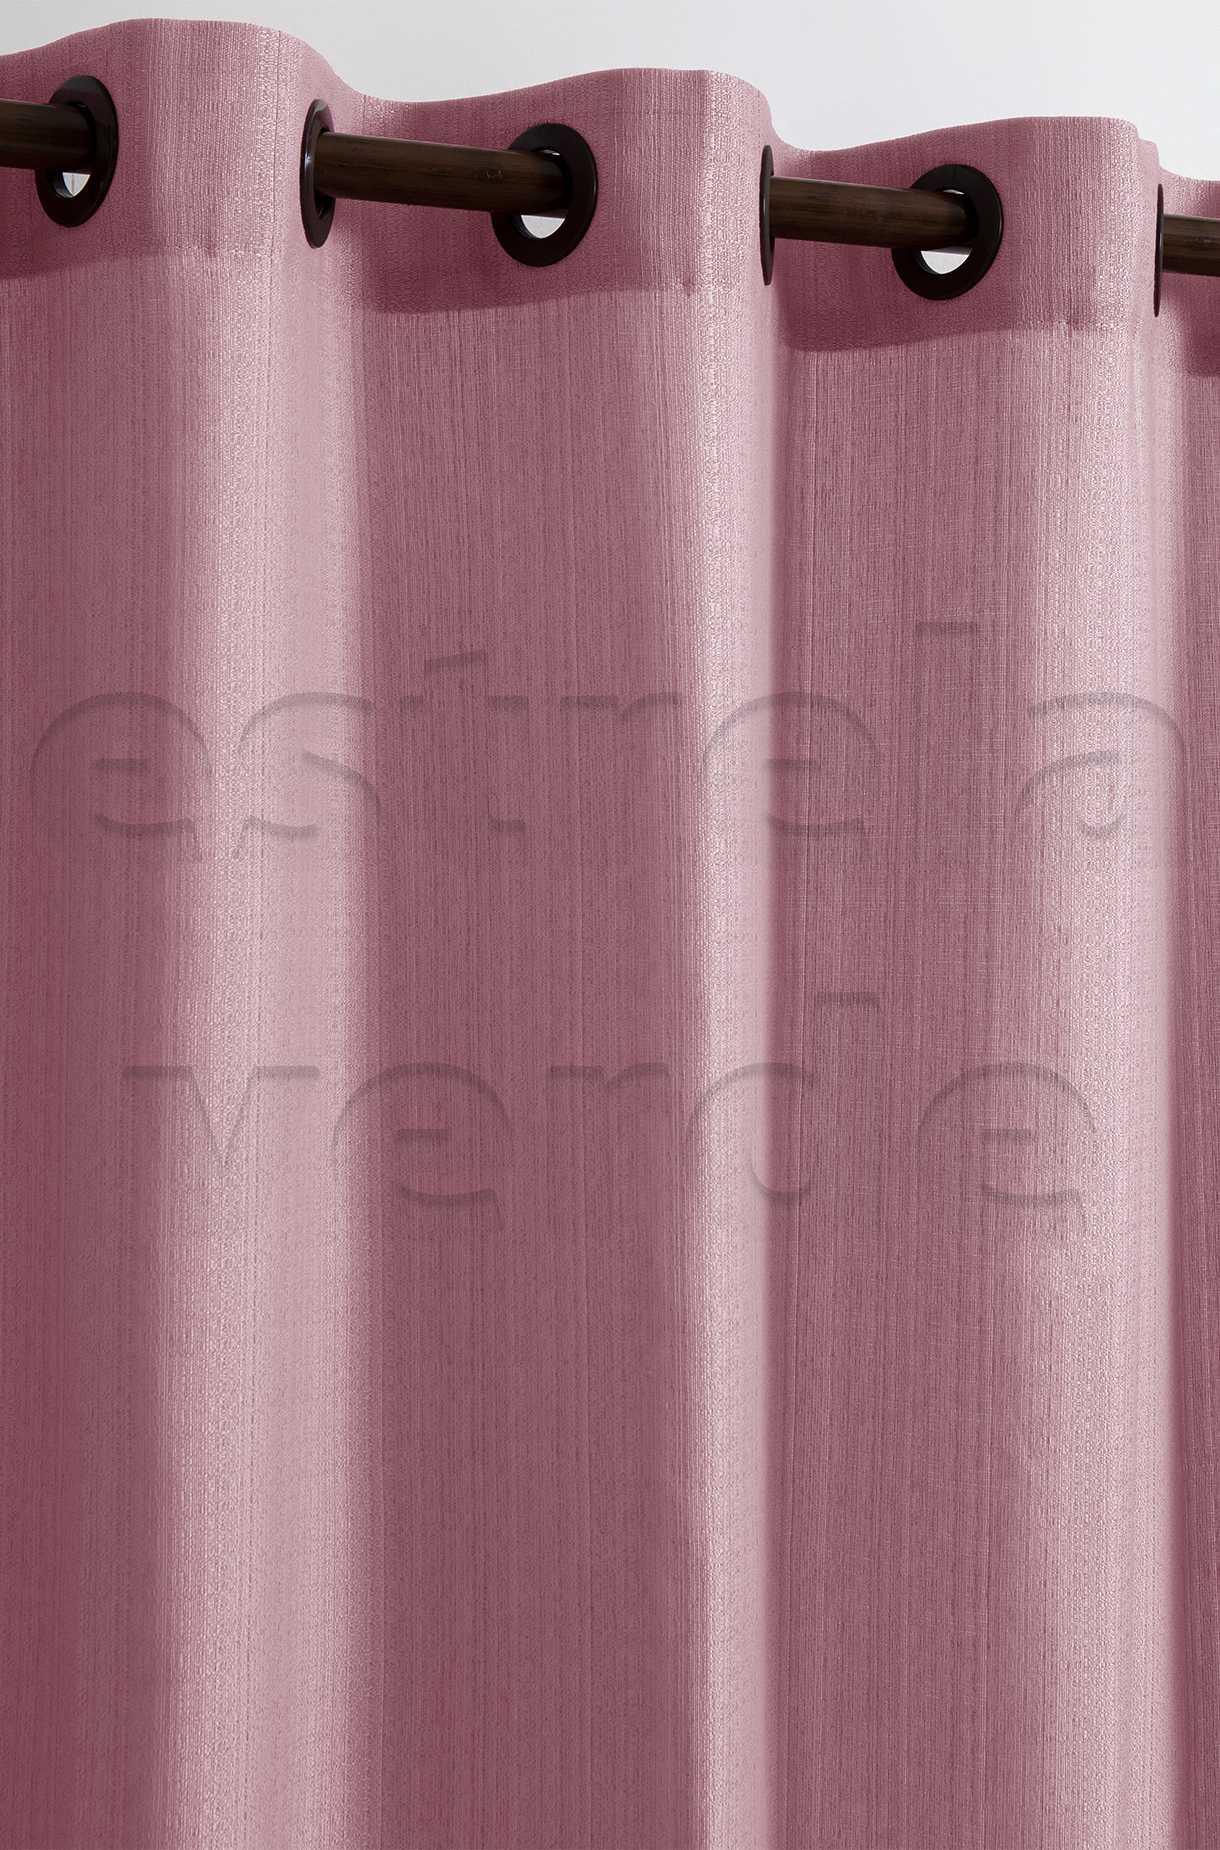 CORTINA VENEZA 2,60X2,30 5172 ROSE  - Estrela Verde